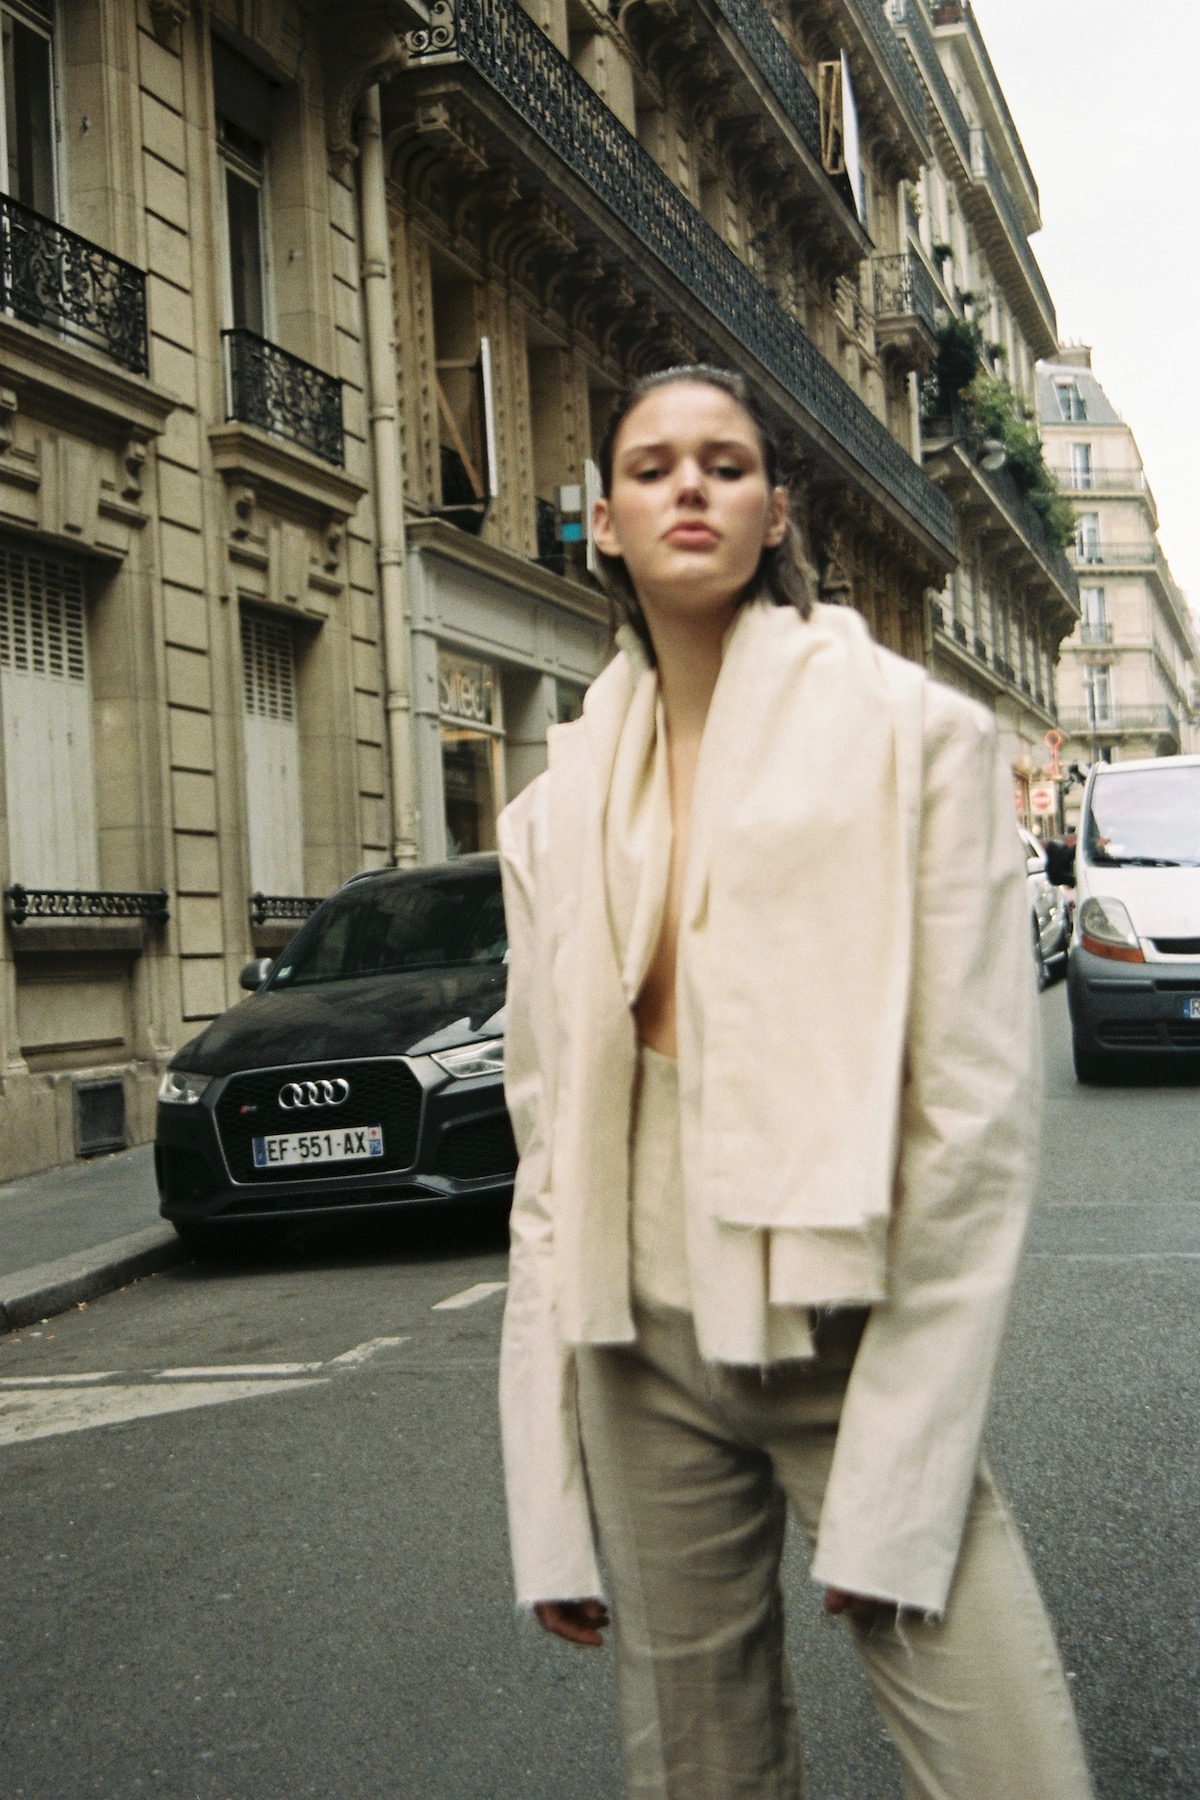 Teeth Magazine Online Emilie Carlach Fashion Film Photography Istituto Marangoni Paris Ophélie Berton